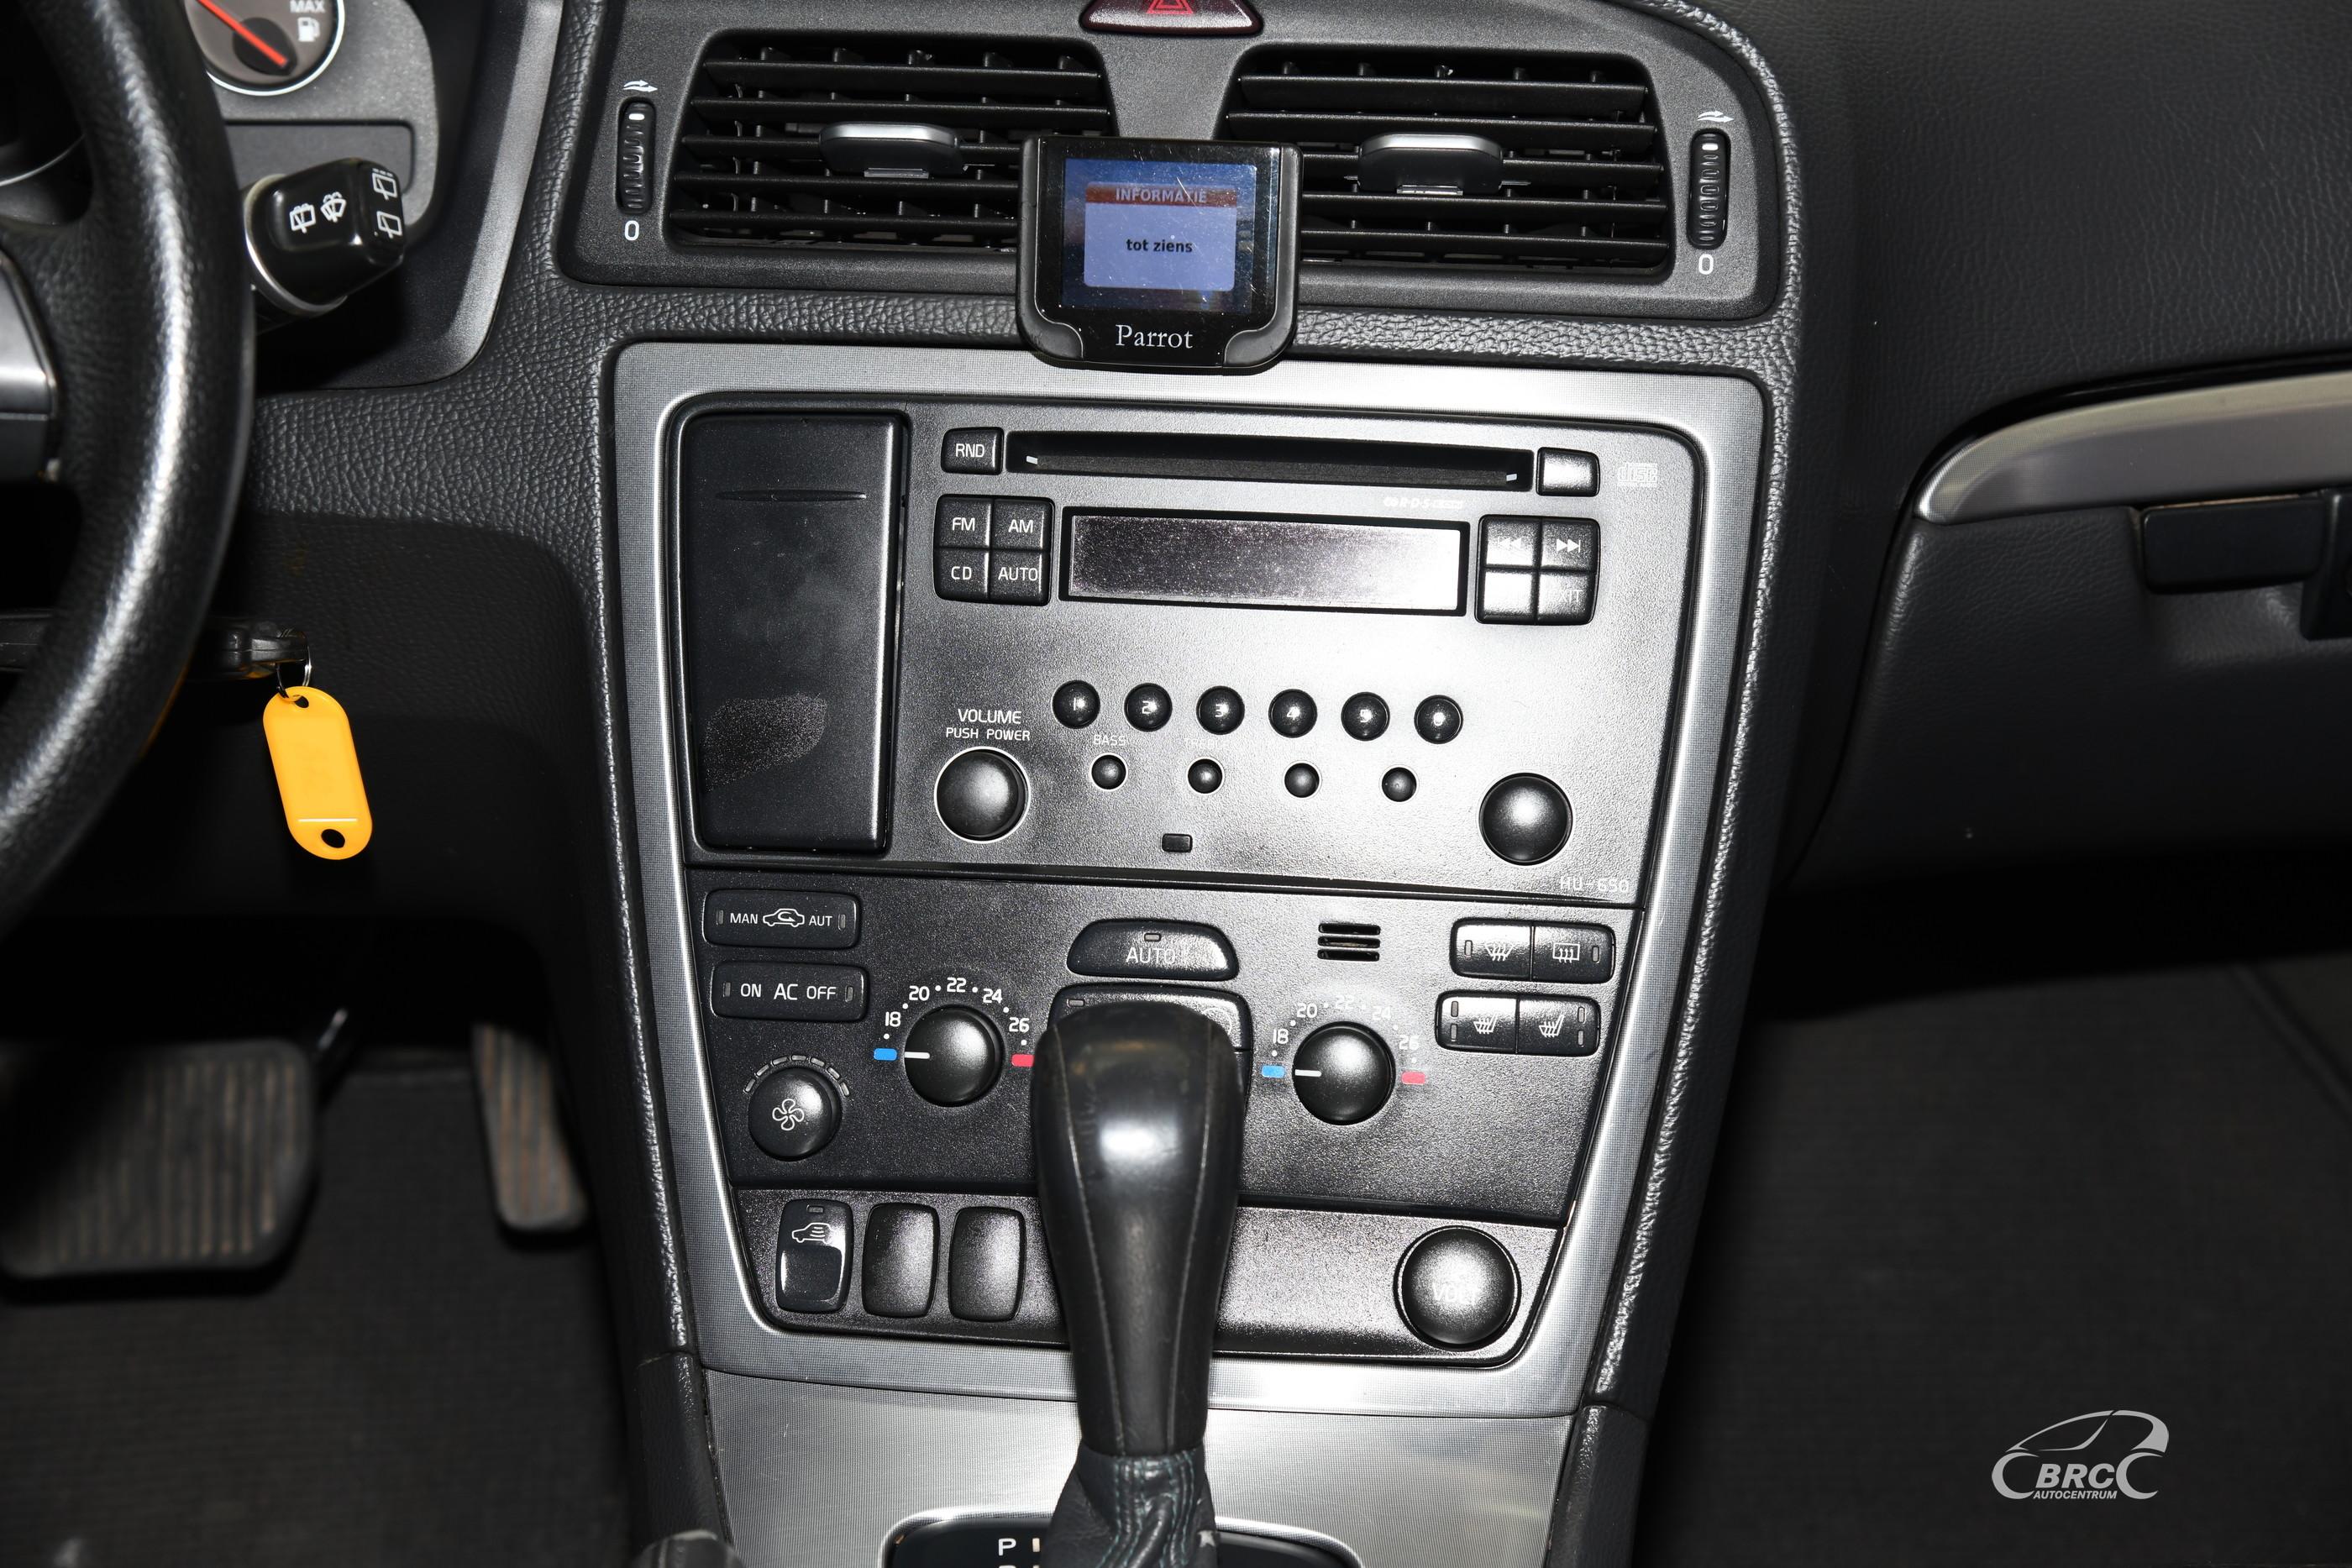 Volvo XC 70 2.4 D5 AWD Cross Country Automatas